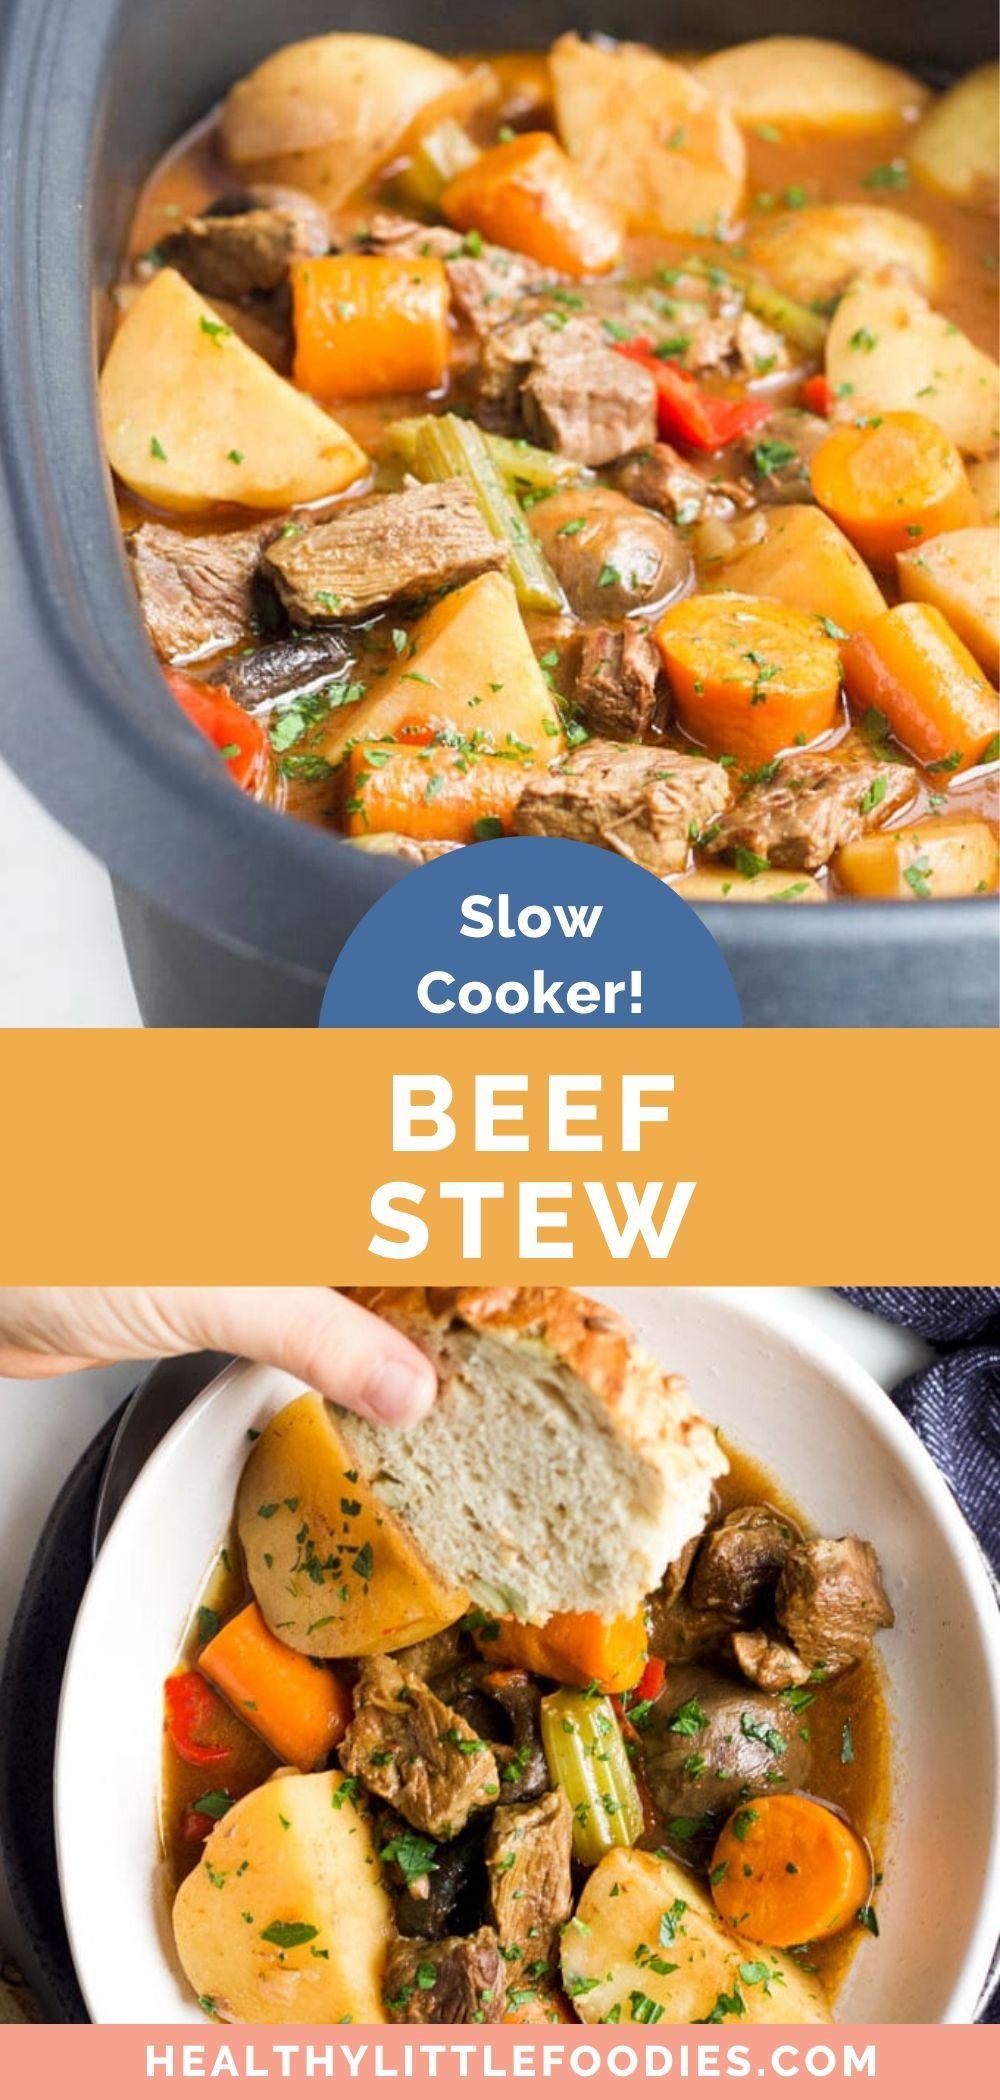 Slow Cooker Beef Stew - Healthy Little Foodies | Recipe ...